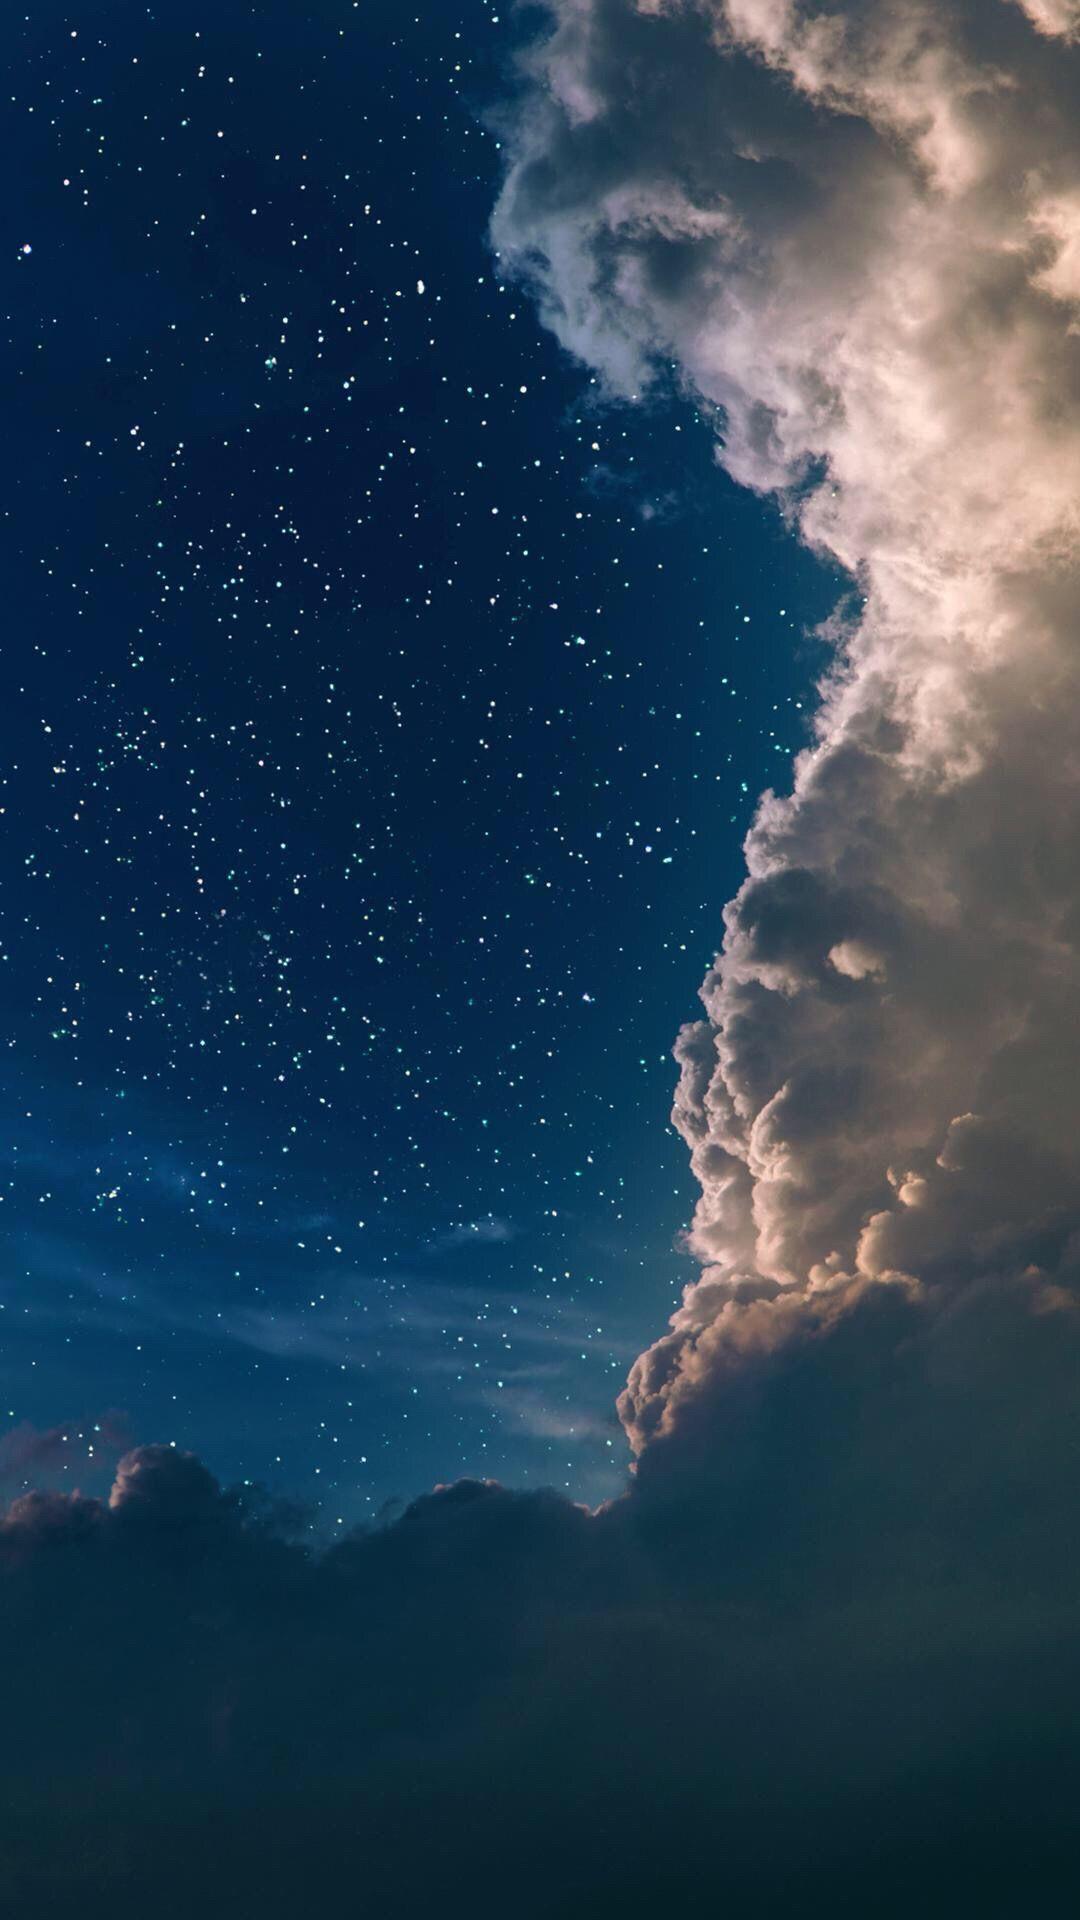 Night Clouds, Star Night, Starry Night Sky, Sky And Clouds, Sky Full Of Sta